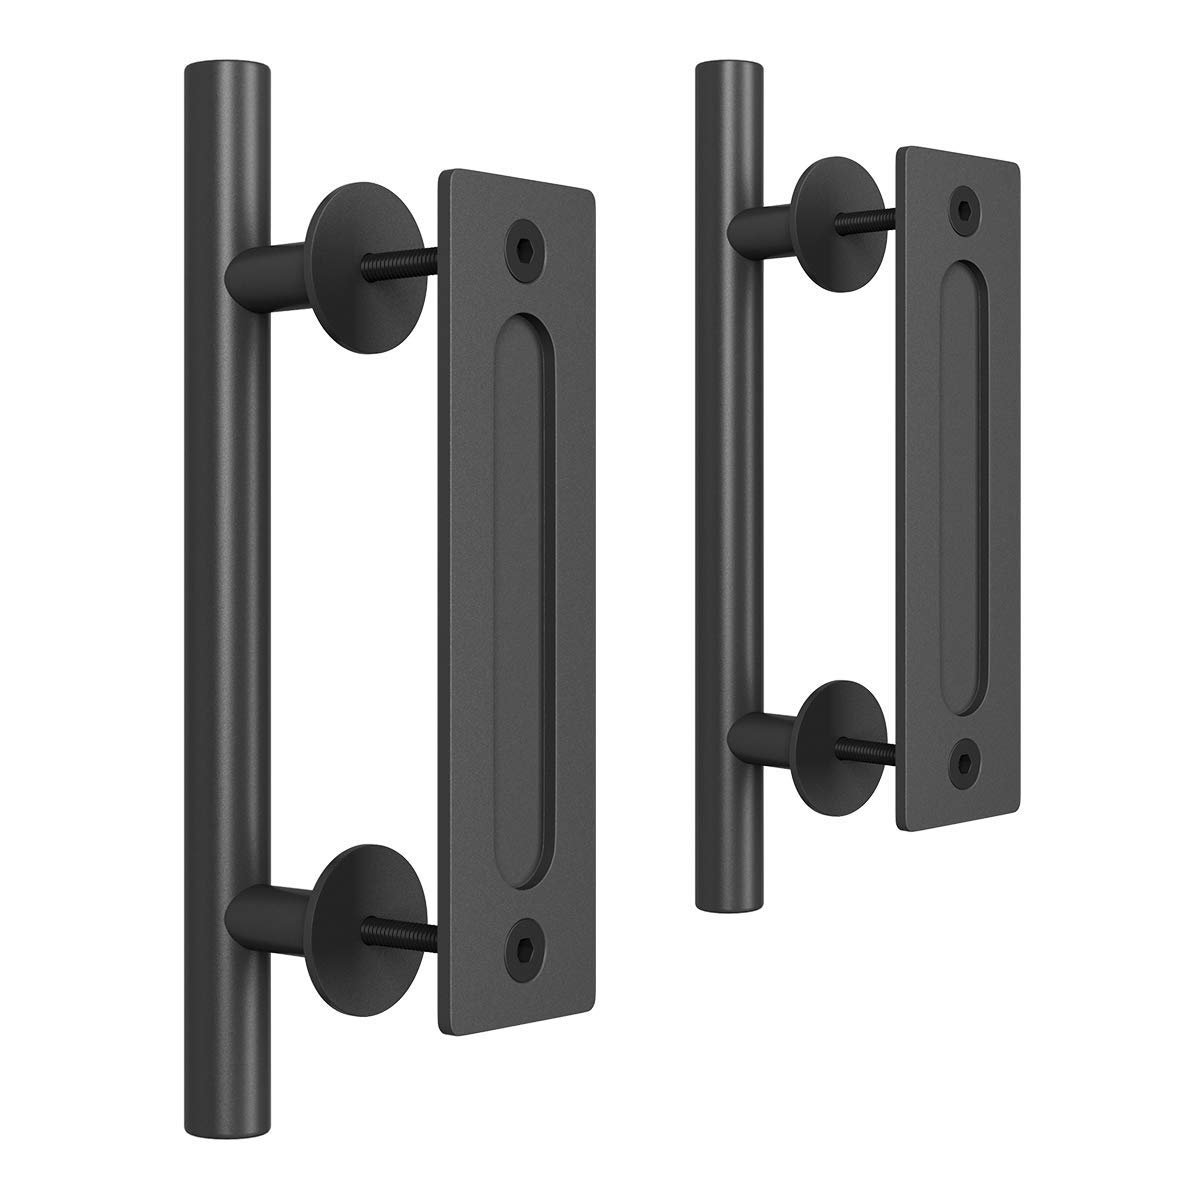 SMARTSTANDARD 2PCS Heavy Duty 12 Inch Sliding Barn Door Handle, Pull and Flush Hardware Set, Black Powder Coated Finish, Large Rustic Two-Side Design, Round